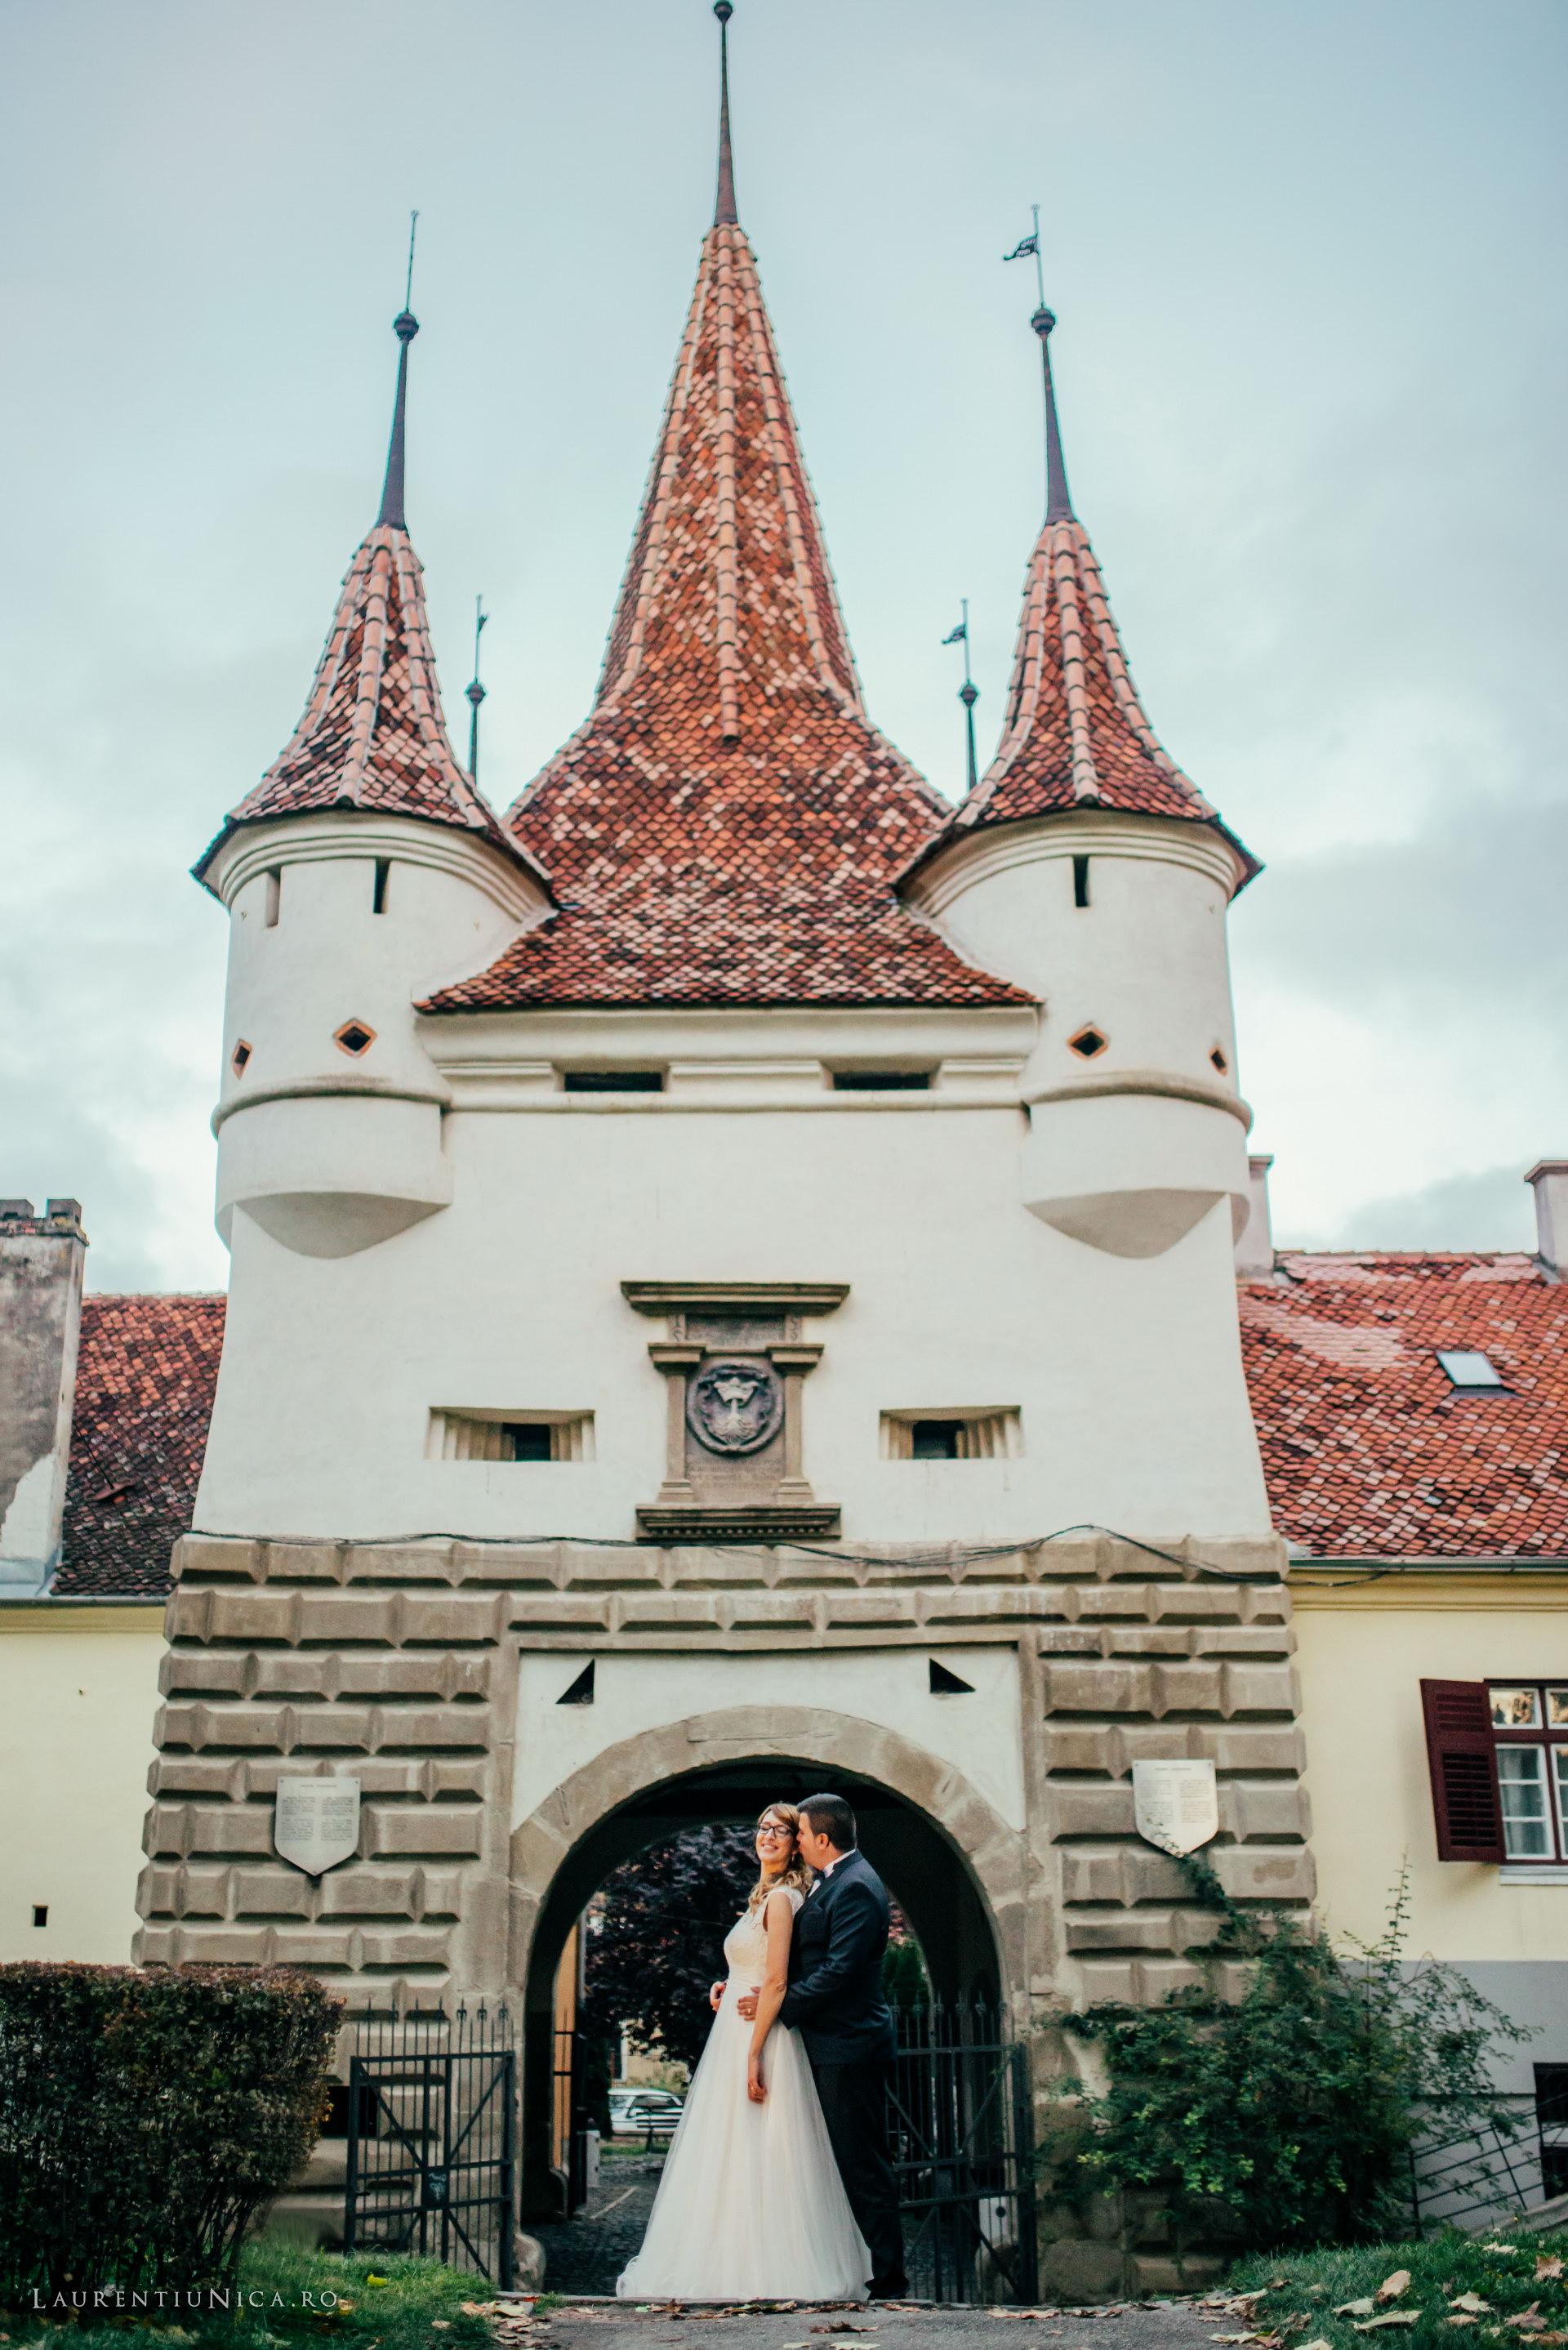 iulia-si-cosmin-fotografii-after-wedding-brasov-laurentiu-nica37